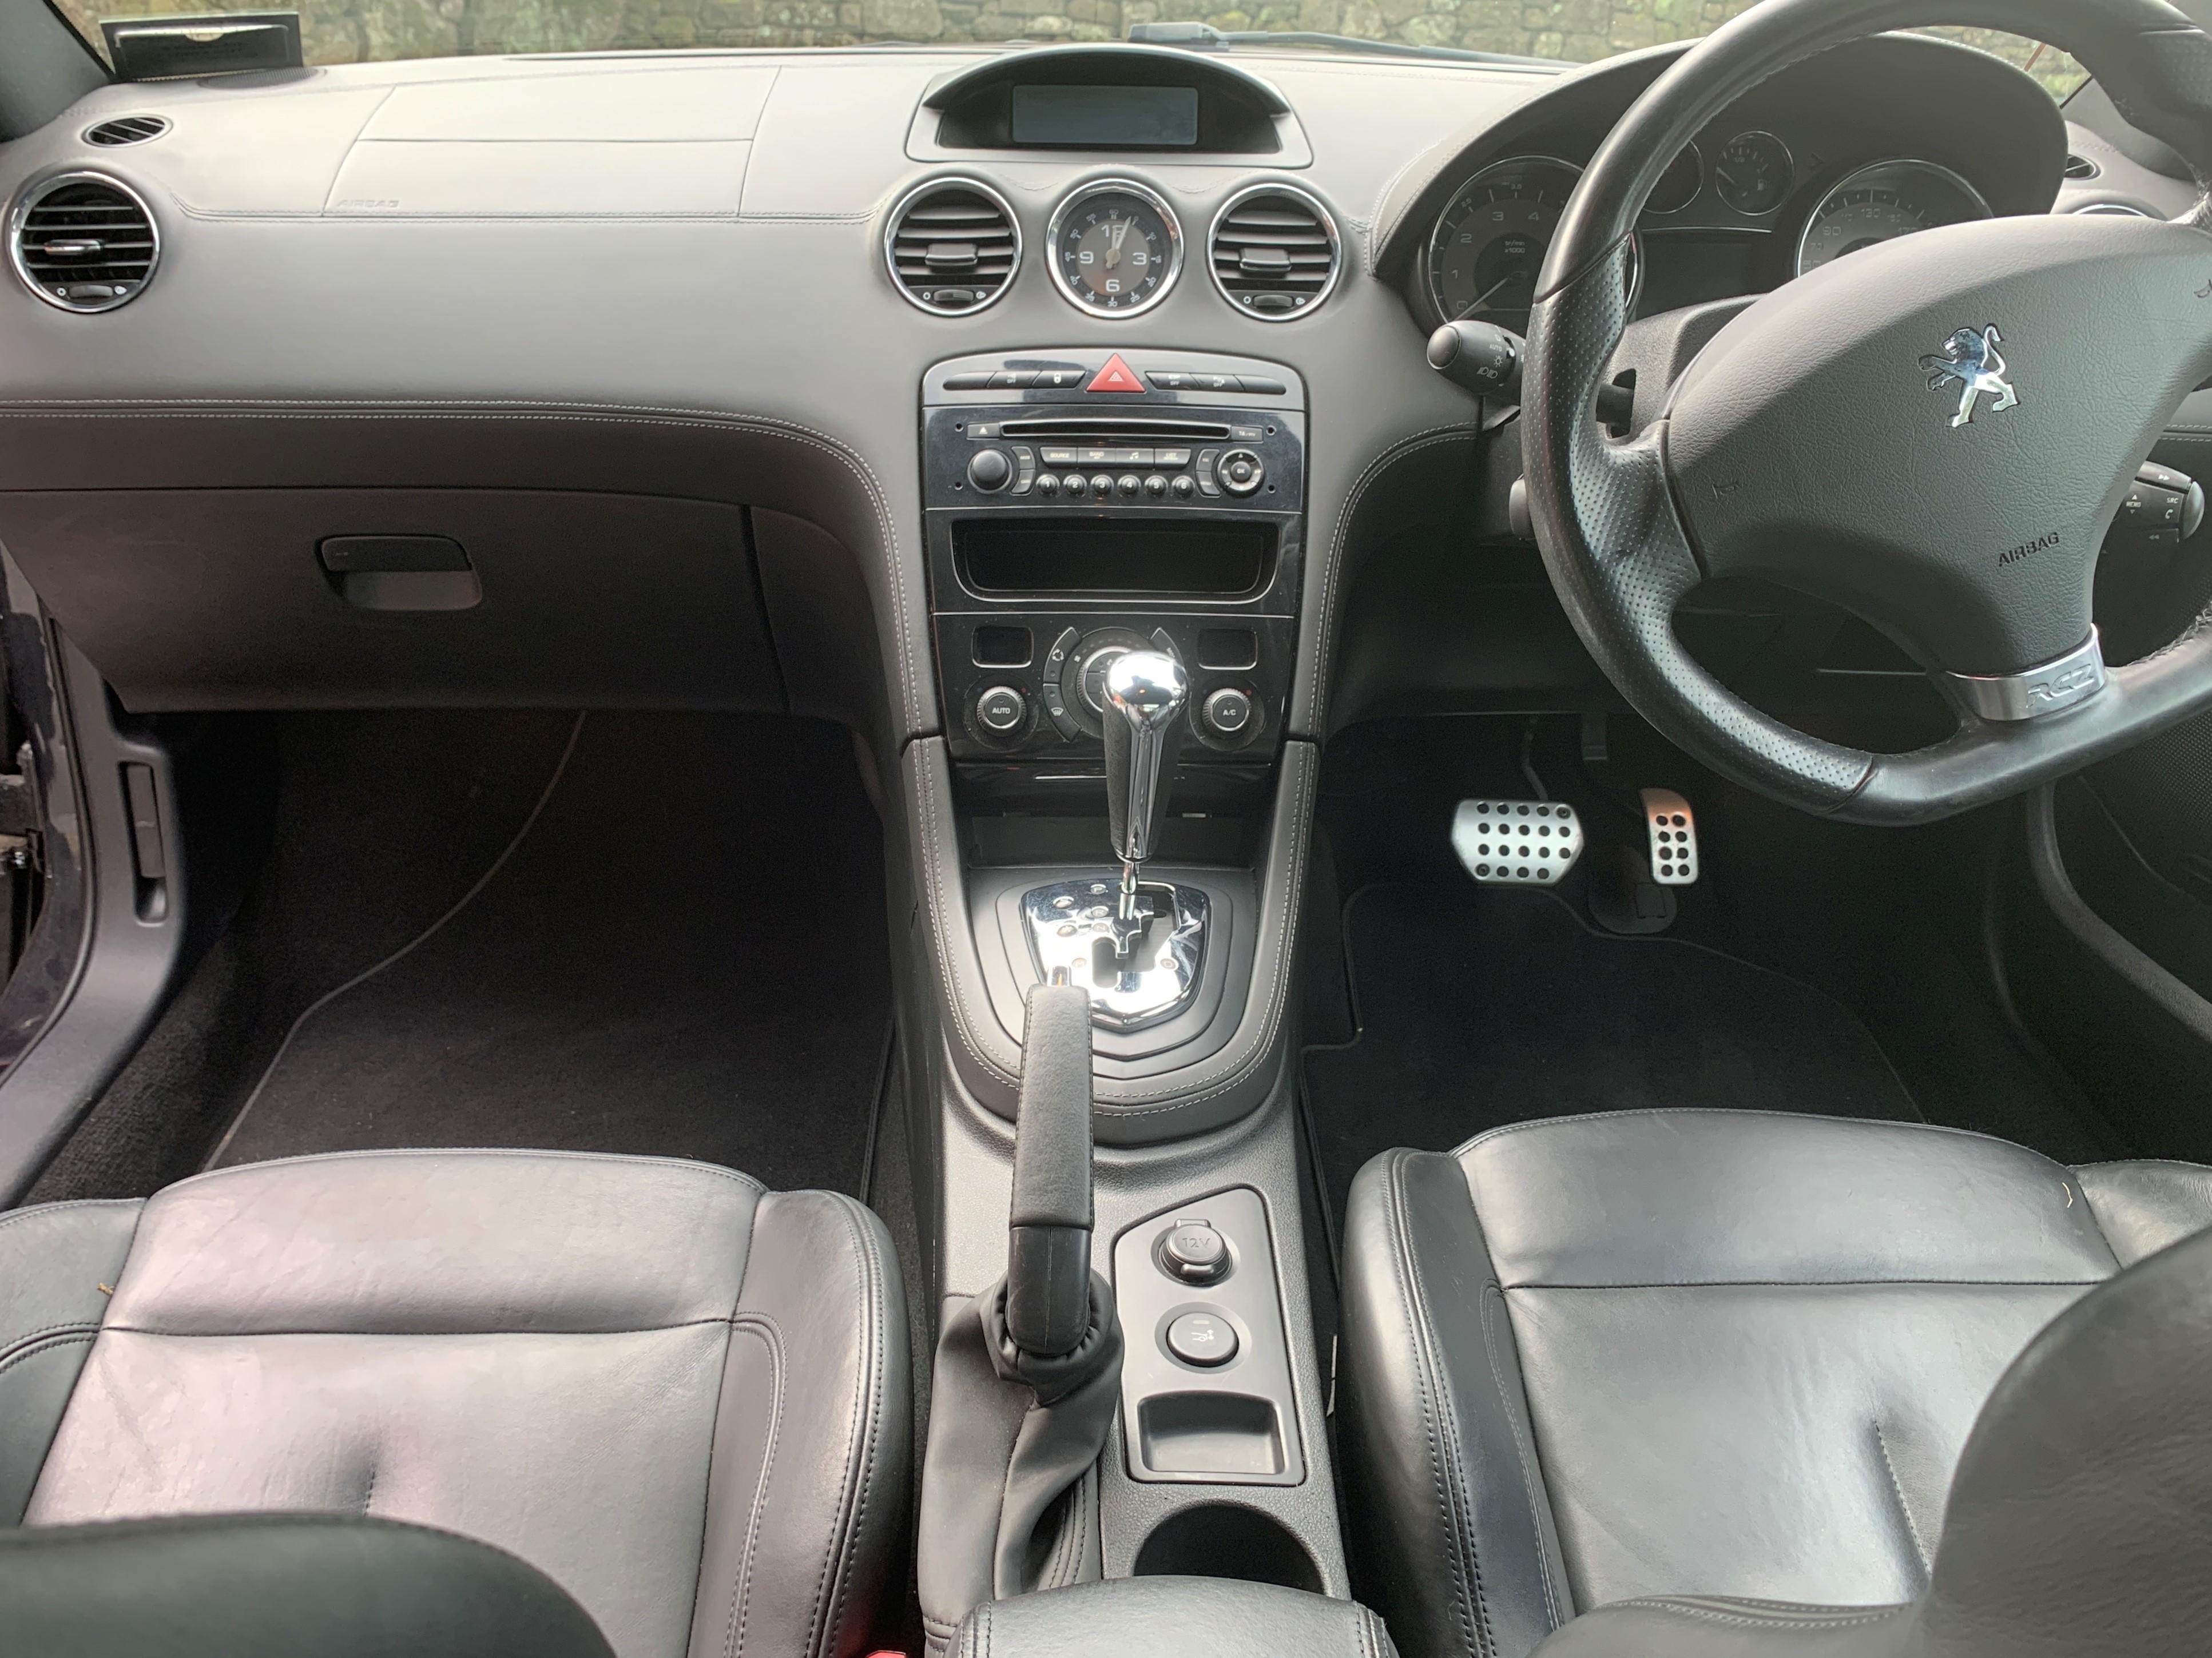 Peugeot RCZ 2011 for sale